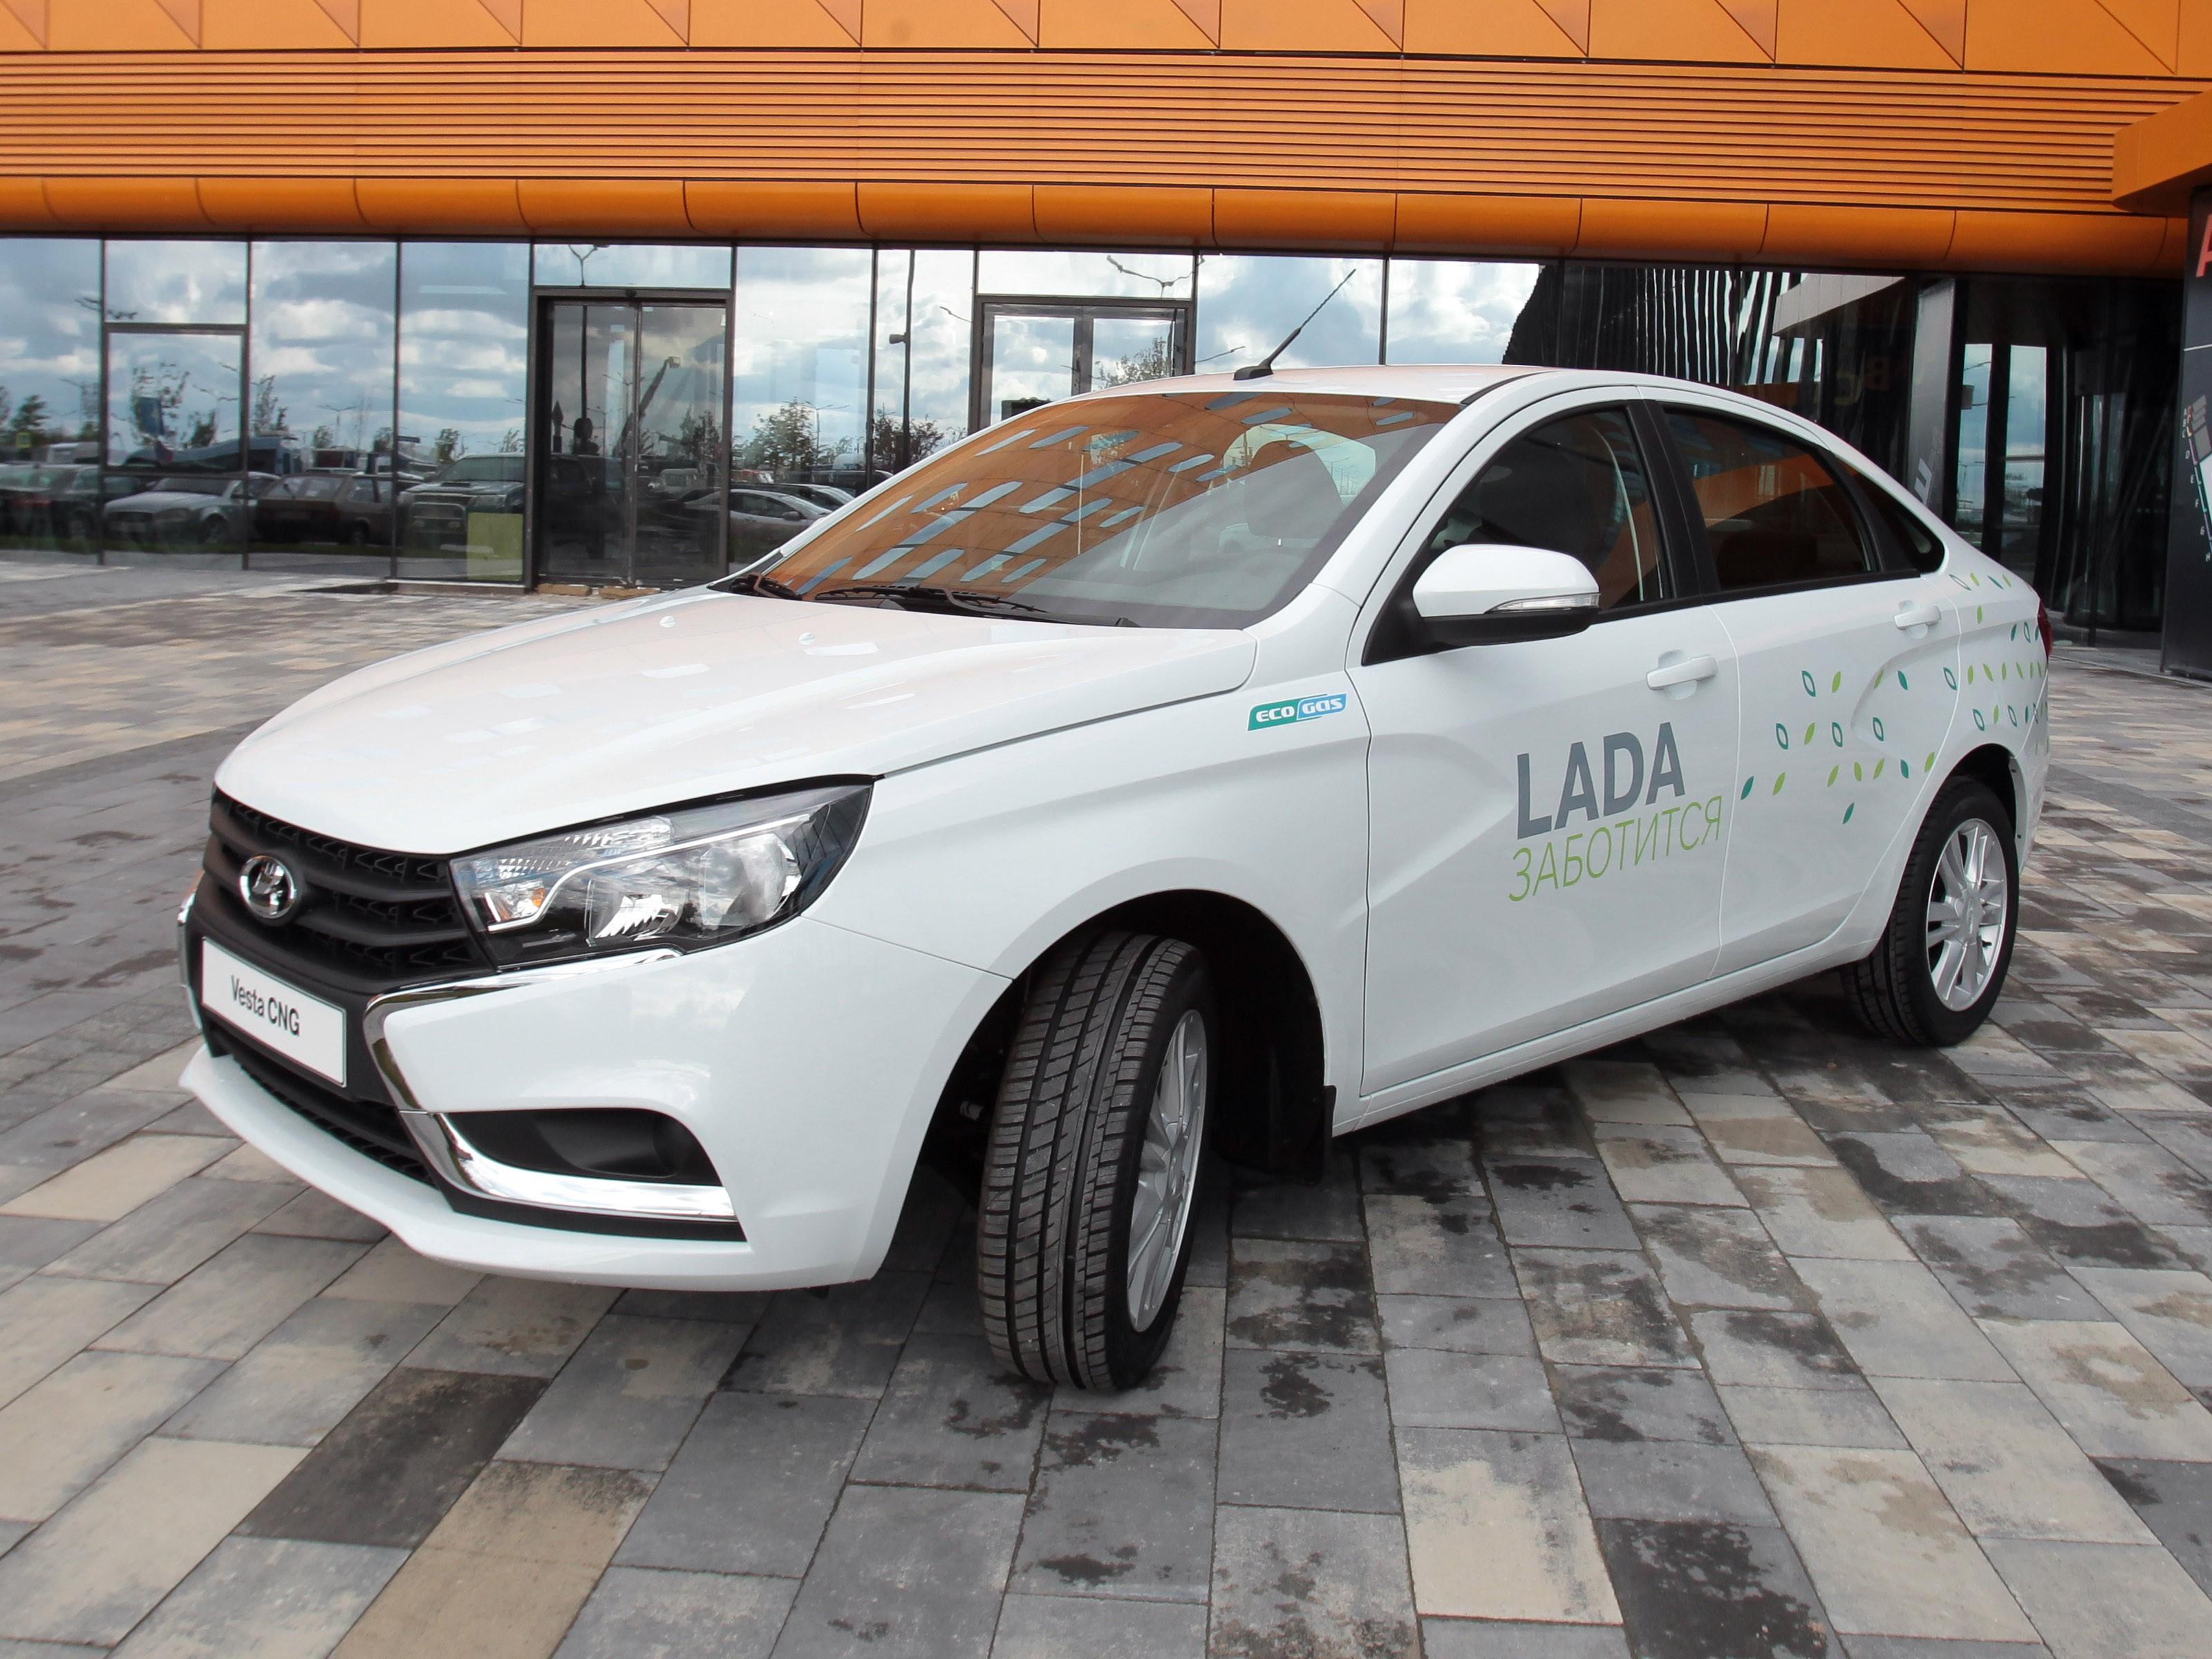 2015 Lada Vesta CNG